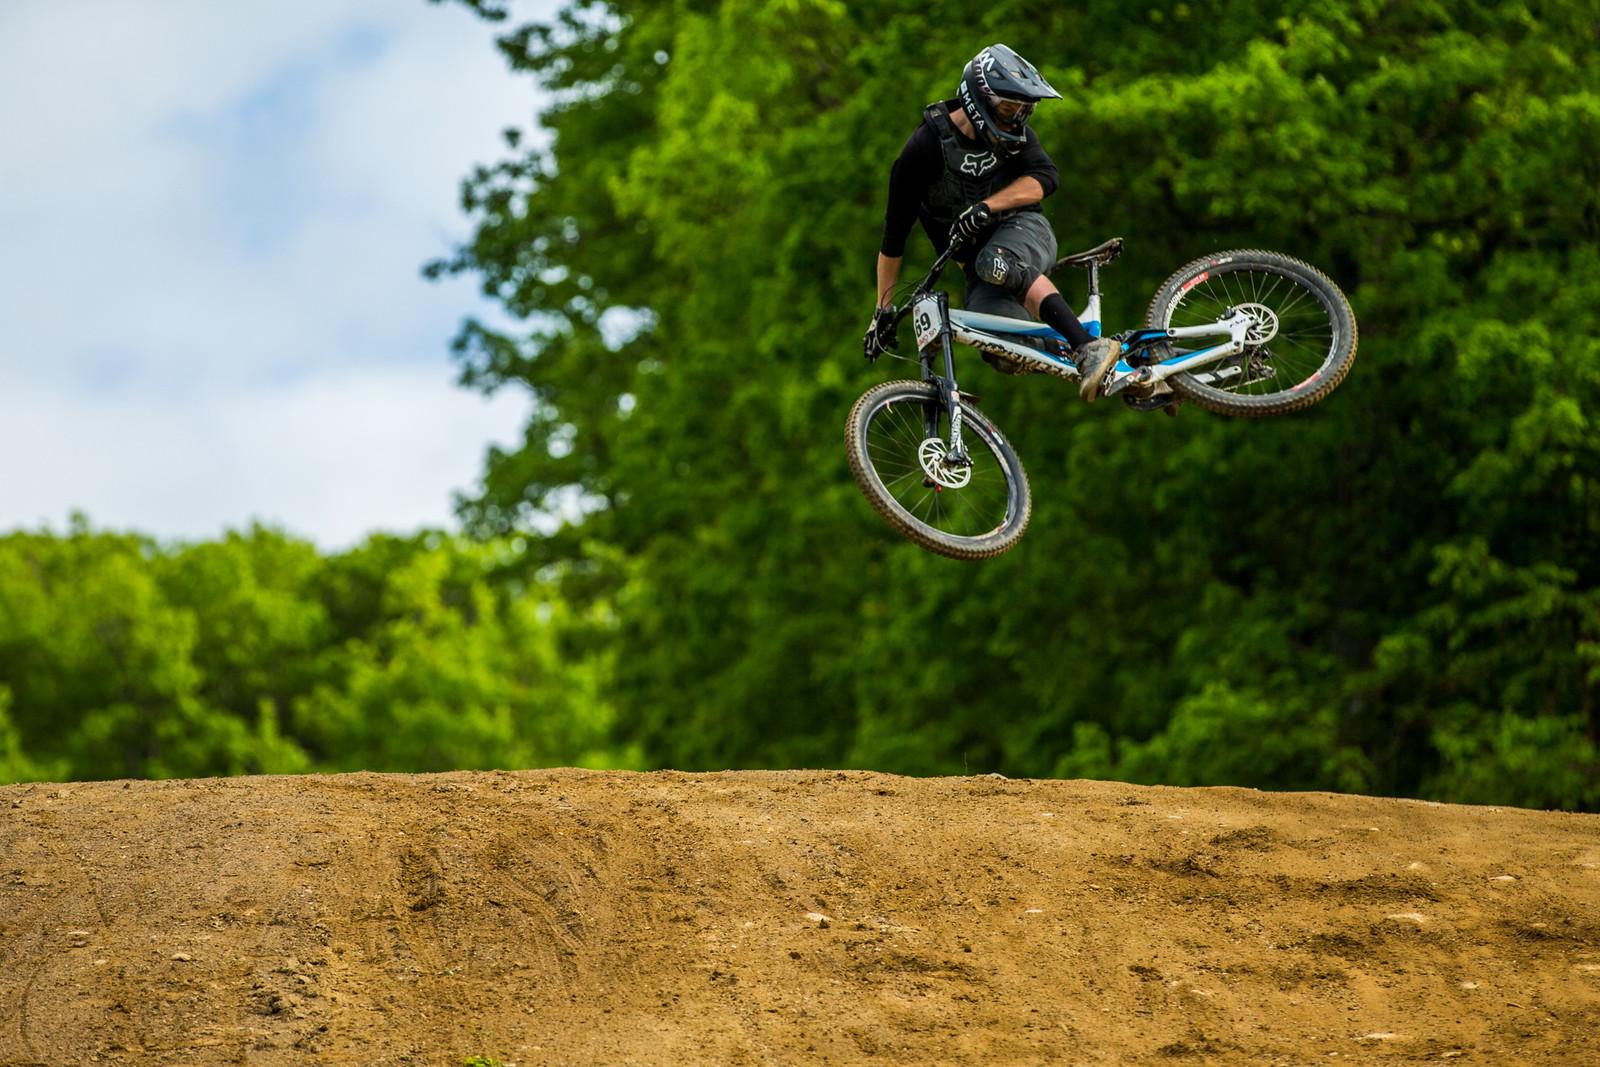 Wiley Kaupas - US Open Whip Off! - Mountain Biking Pictures - Vital MTB